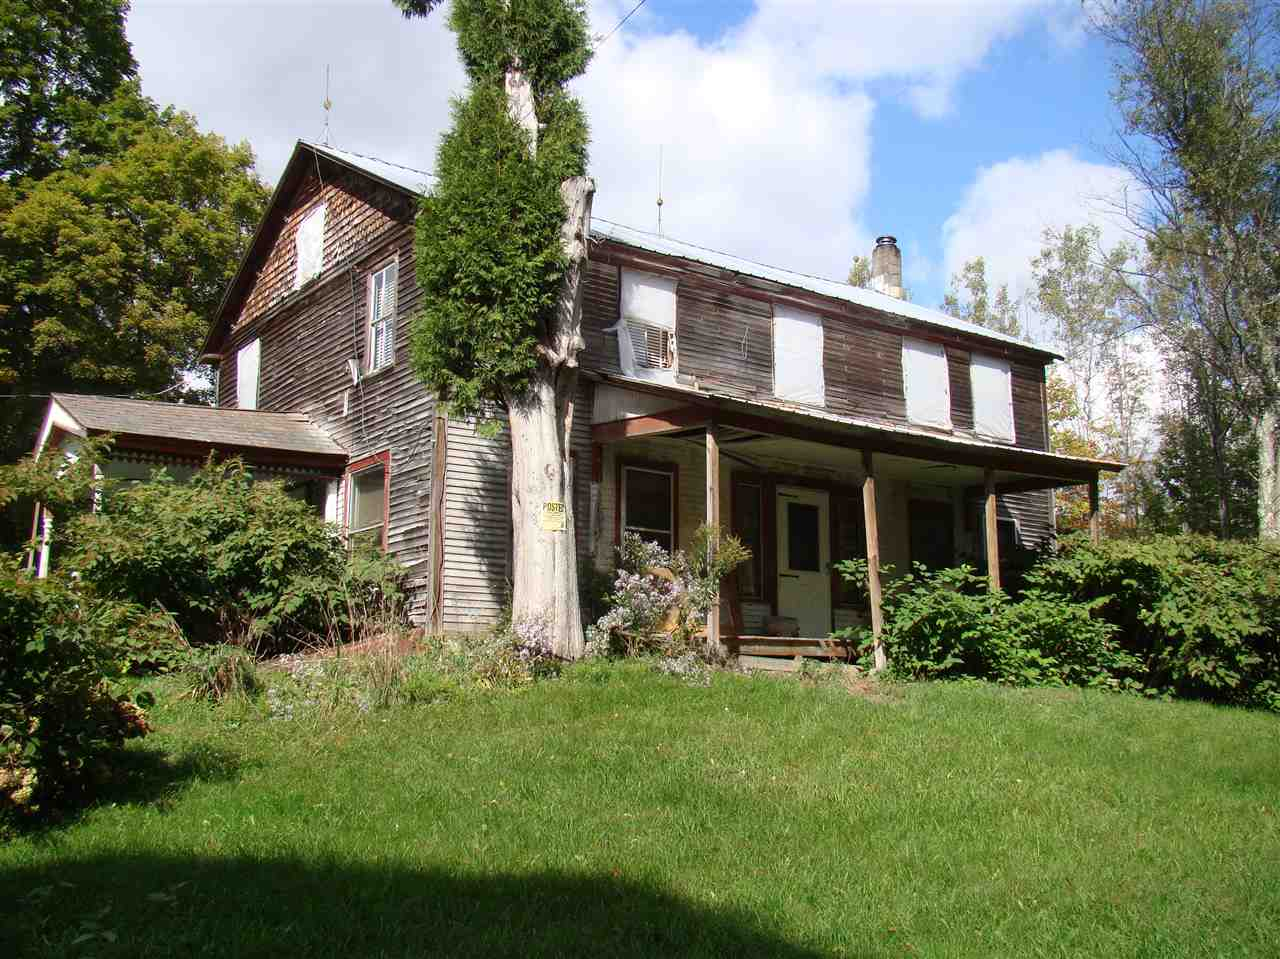 451 clark hollow road poultney vt vermont real estate for Vermont home insurance